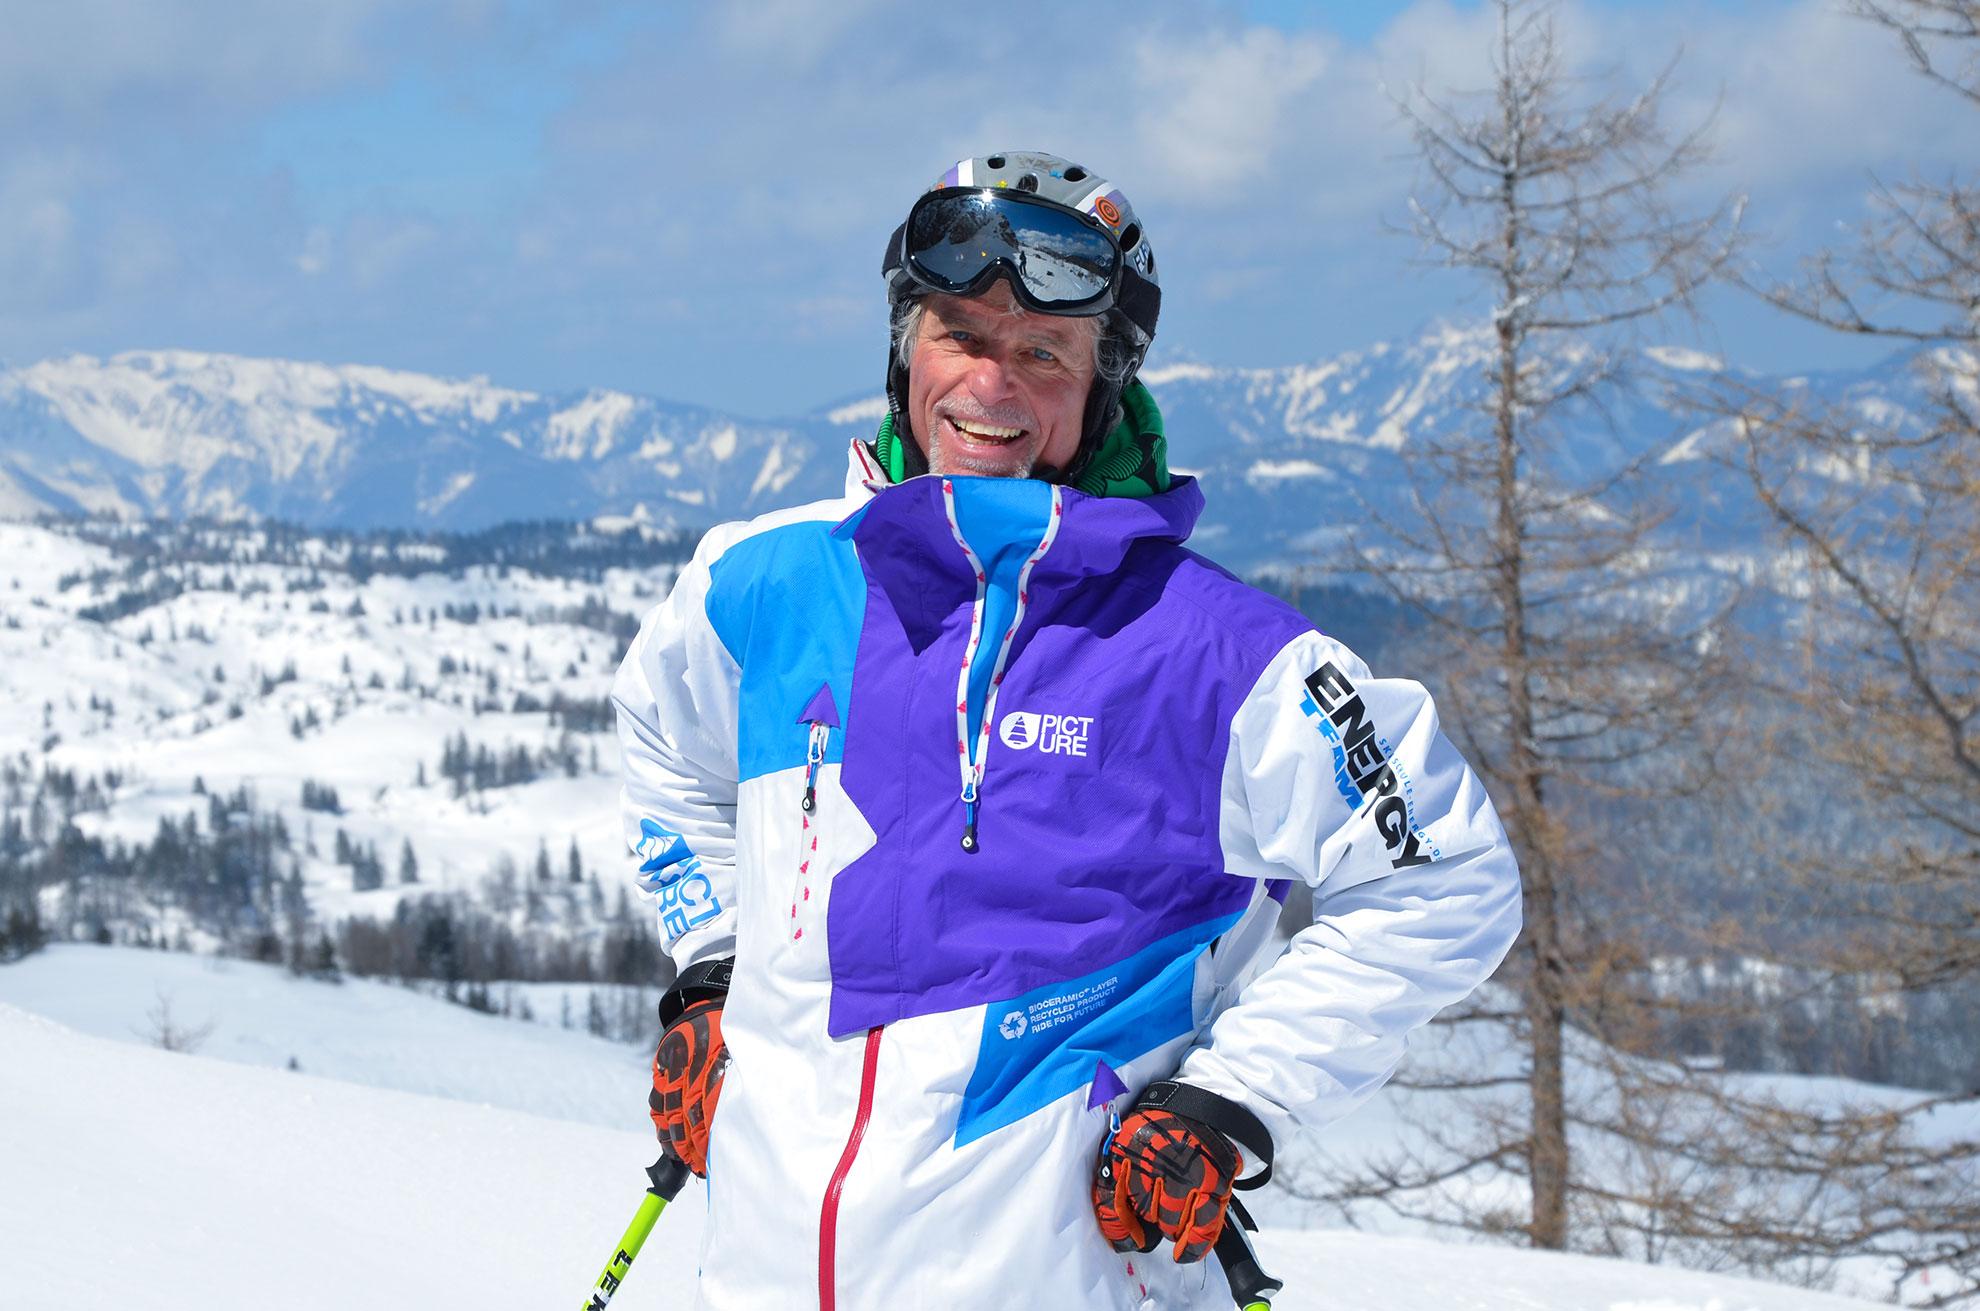 Skischule Energy, Caspar Chucholowski